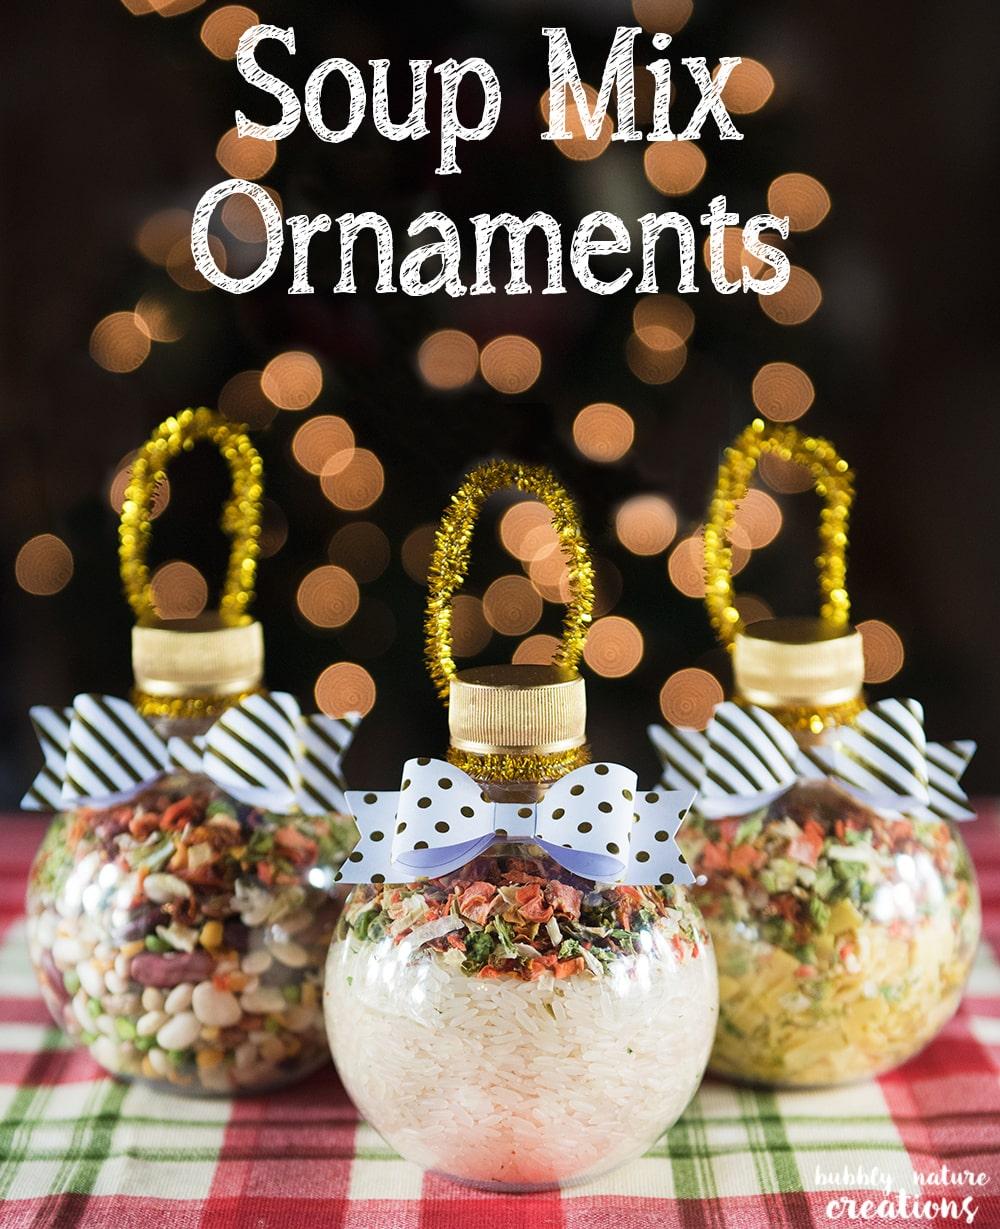 Diy Sprinkle Ornaments: Soup Mix Ornaments